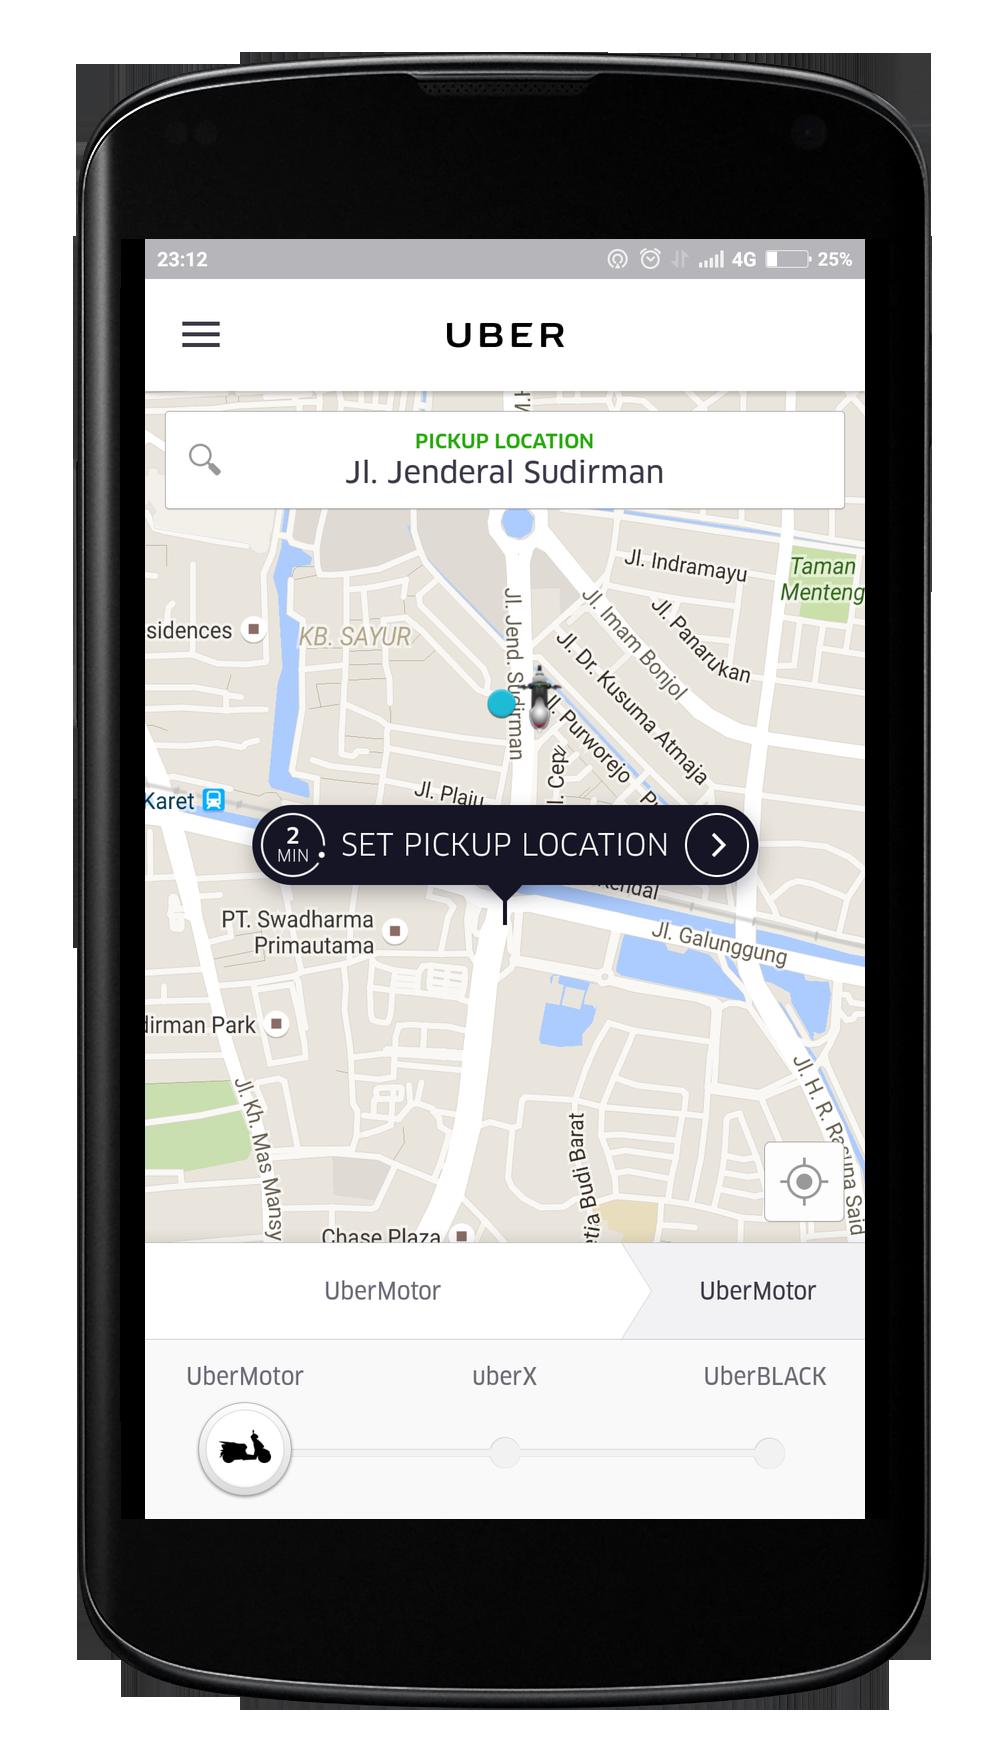 uberMOTOR Screenshot App copy